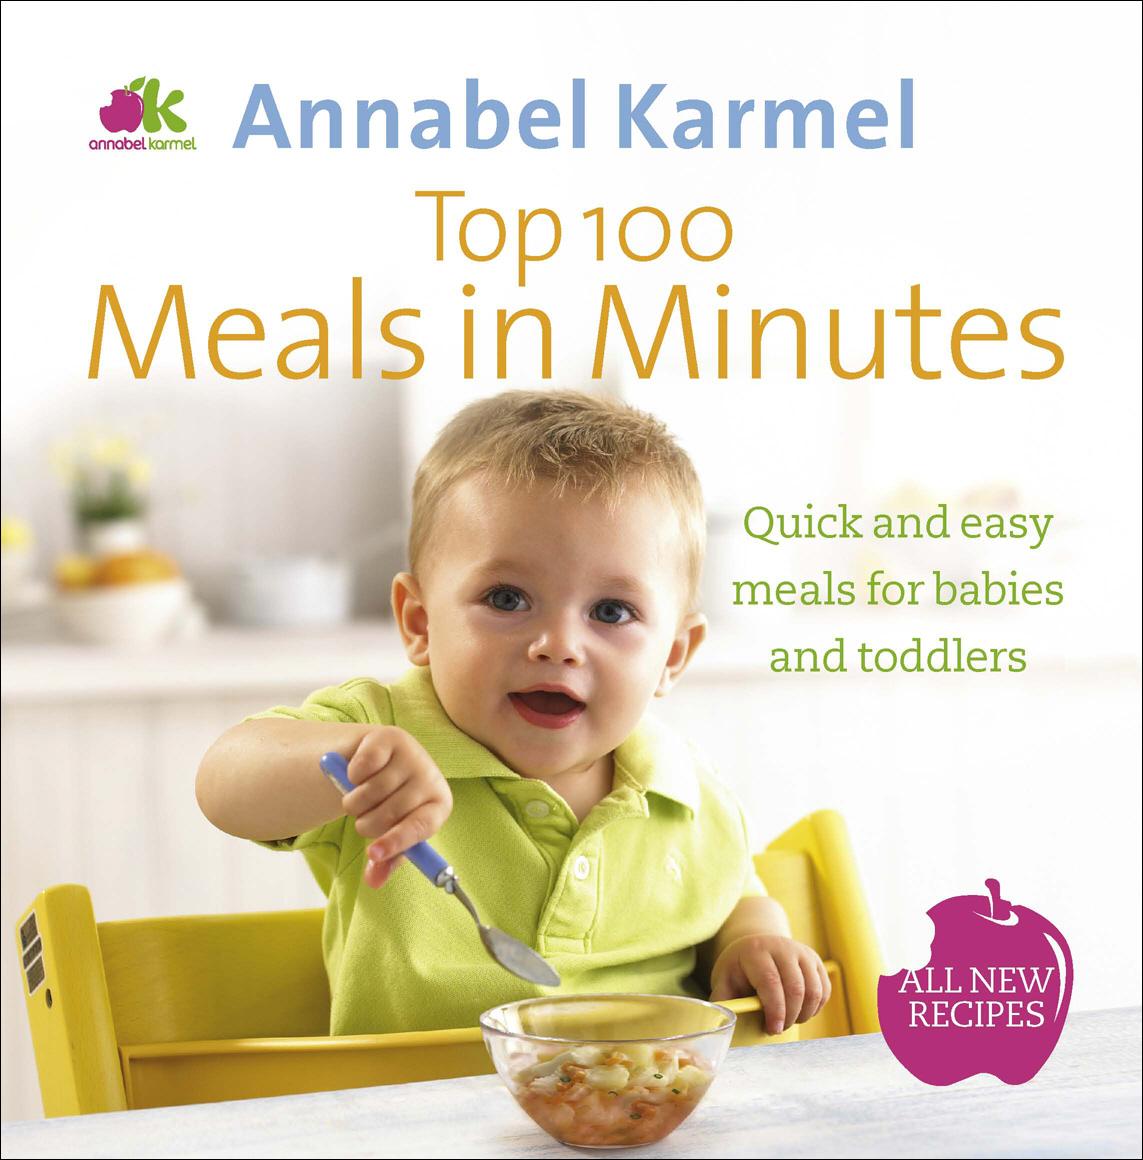 Top 100 Meals in Minutes